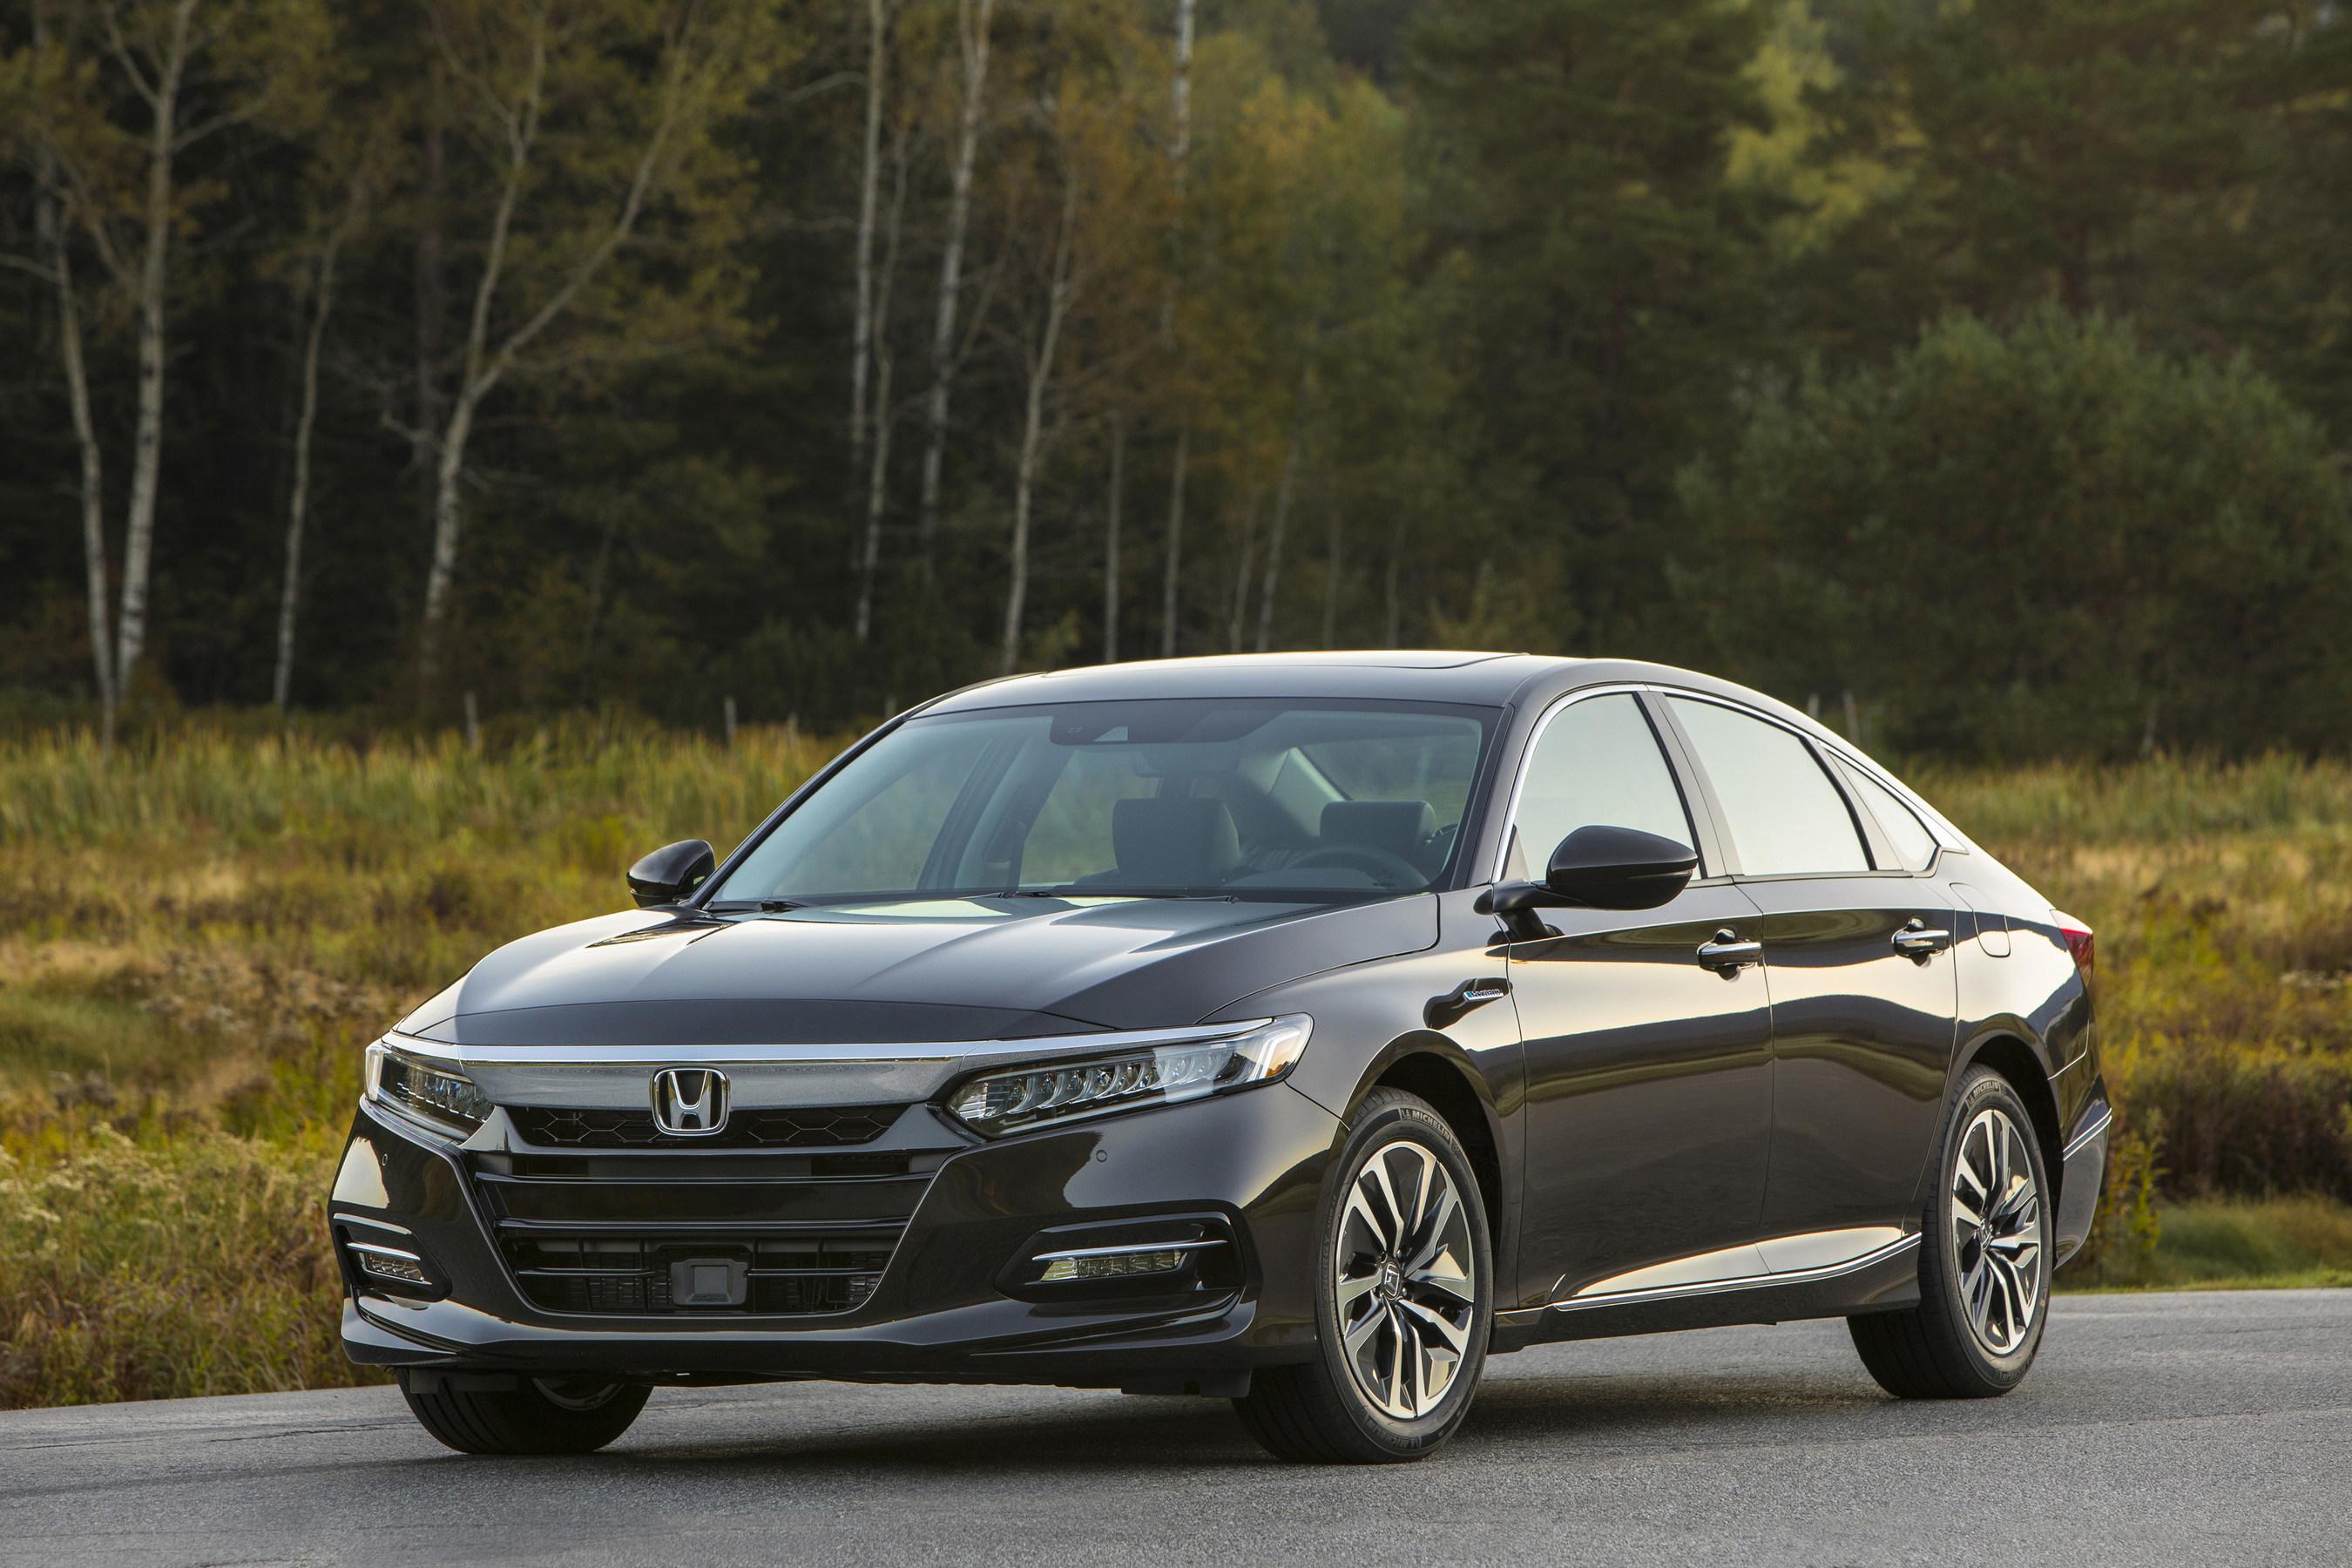 2020 Honda Accord Hybrid Release Date